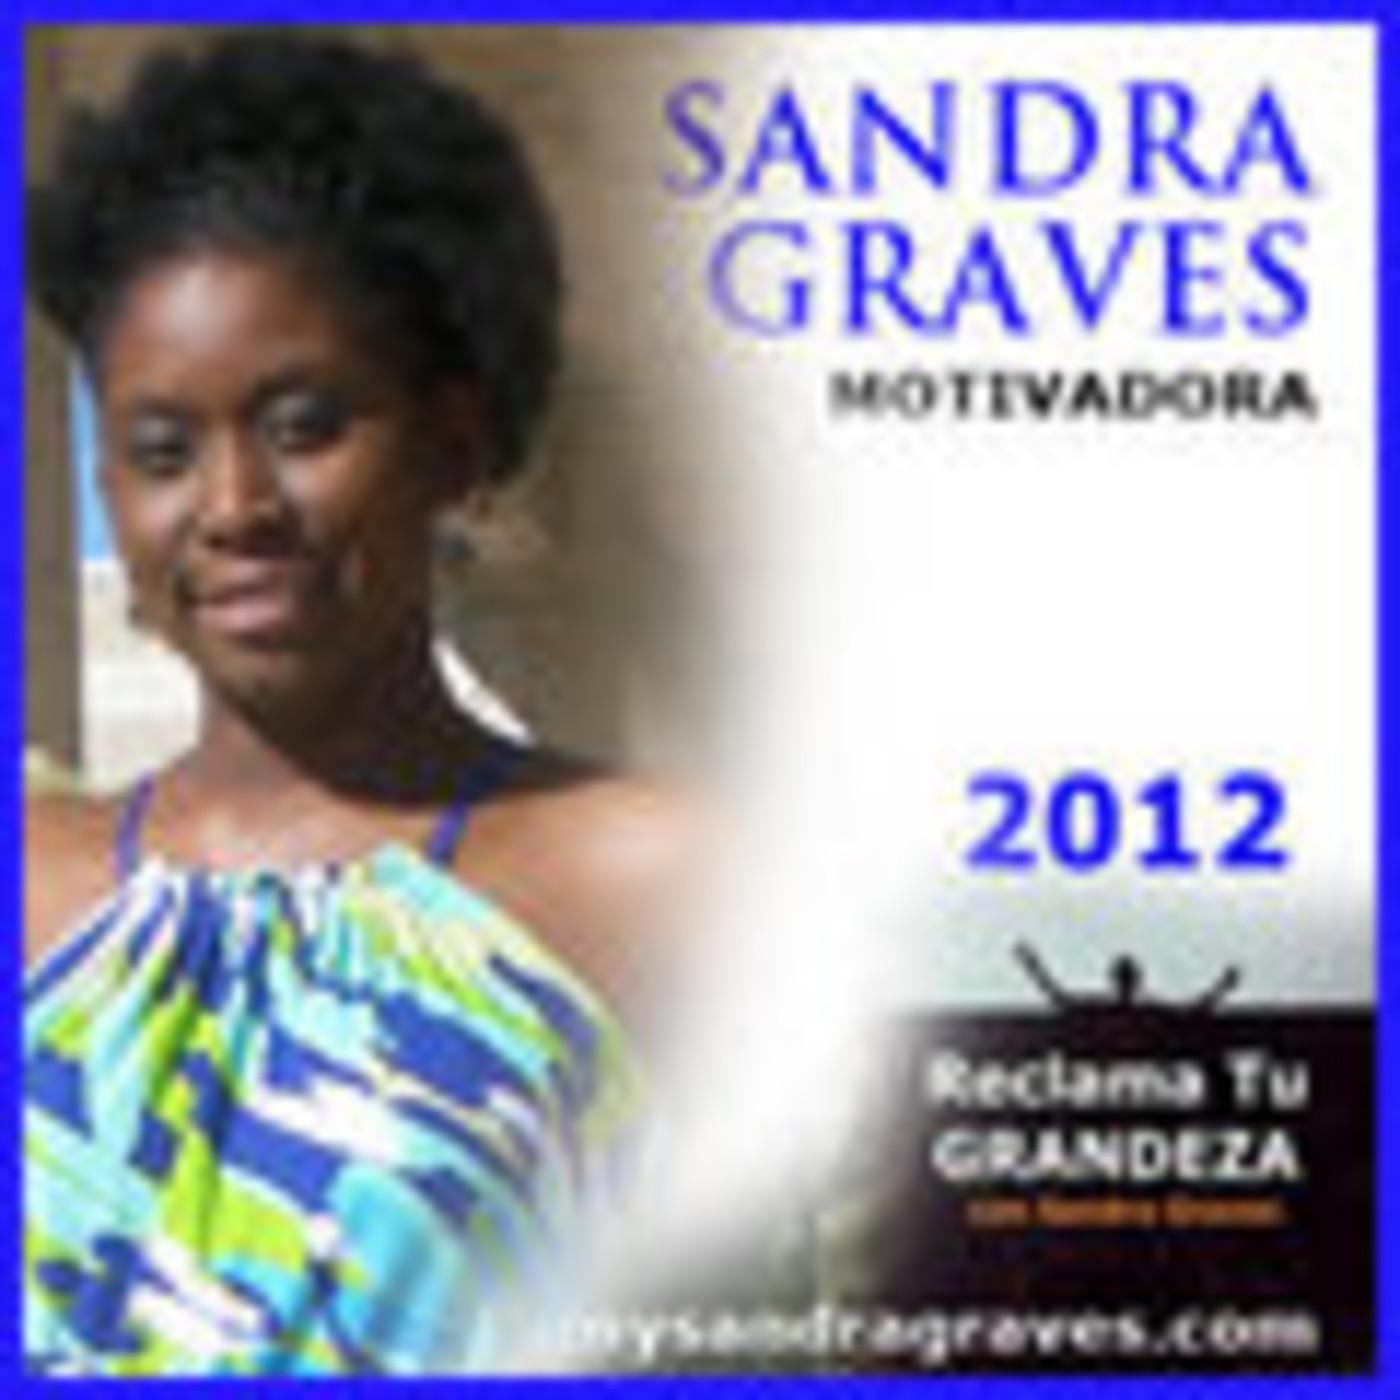 Sandra Graves Motivadora